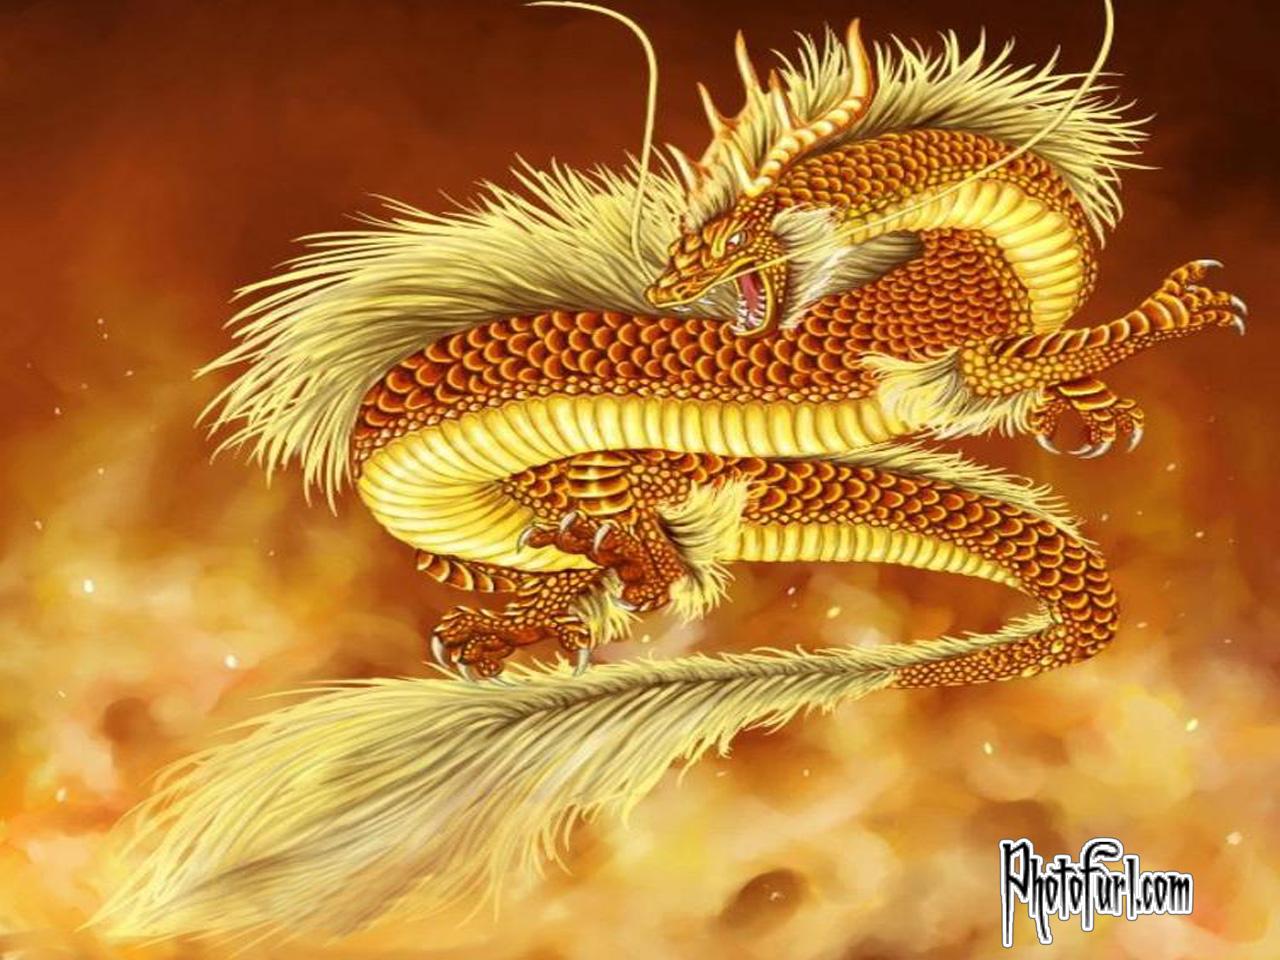 http://1.bp.blogspot.com/-YV3oO8CAbTw/TcpftoB8YCI/AAAAAAAACJU/EW946iHNlAs/s1600/dragongoldfire_free_download_wallpaper.jpg